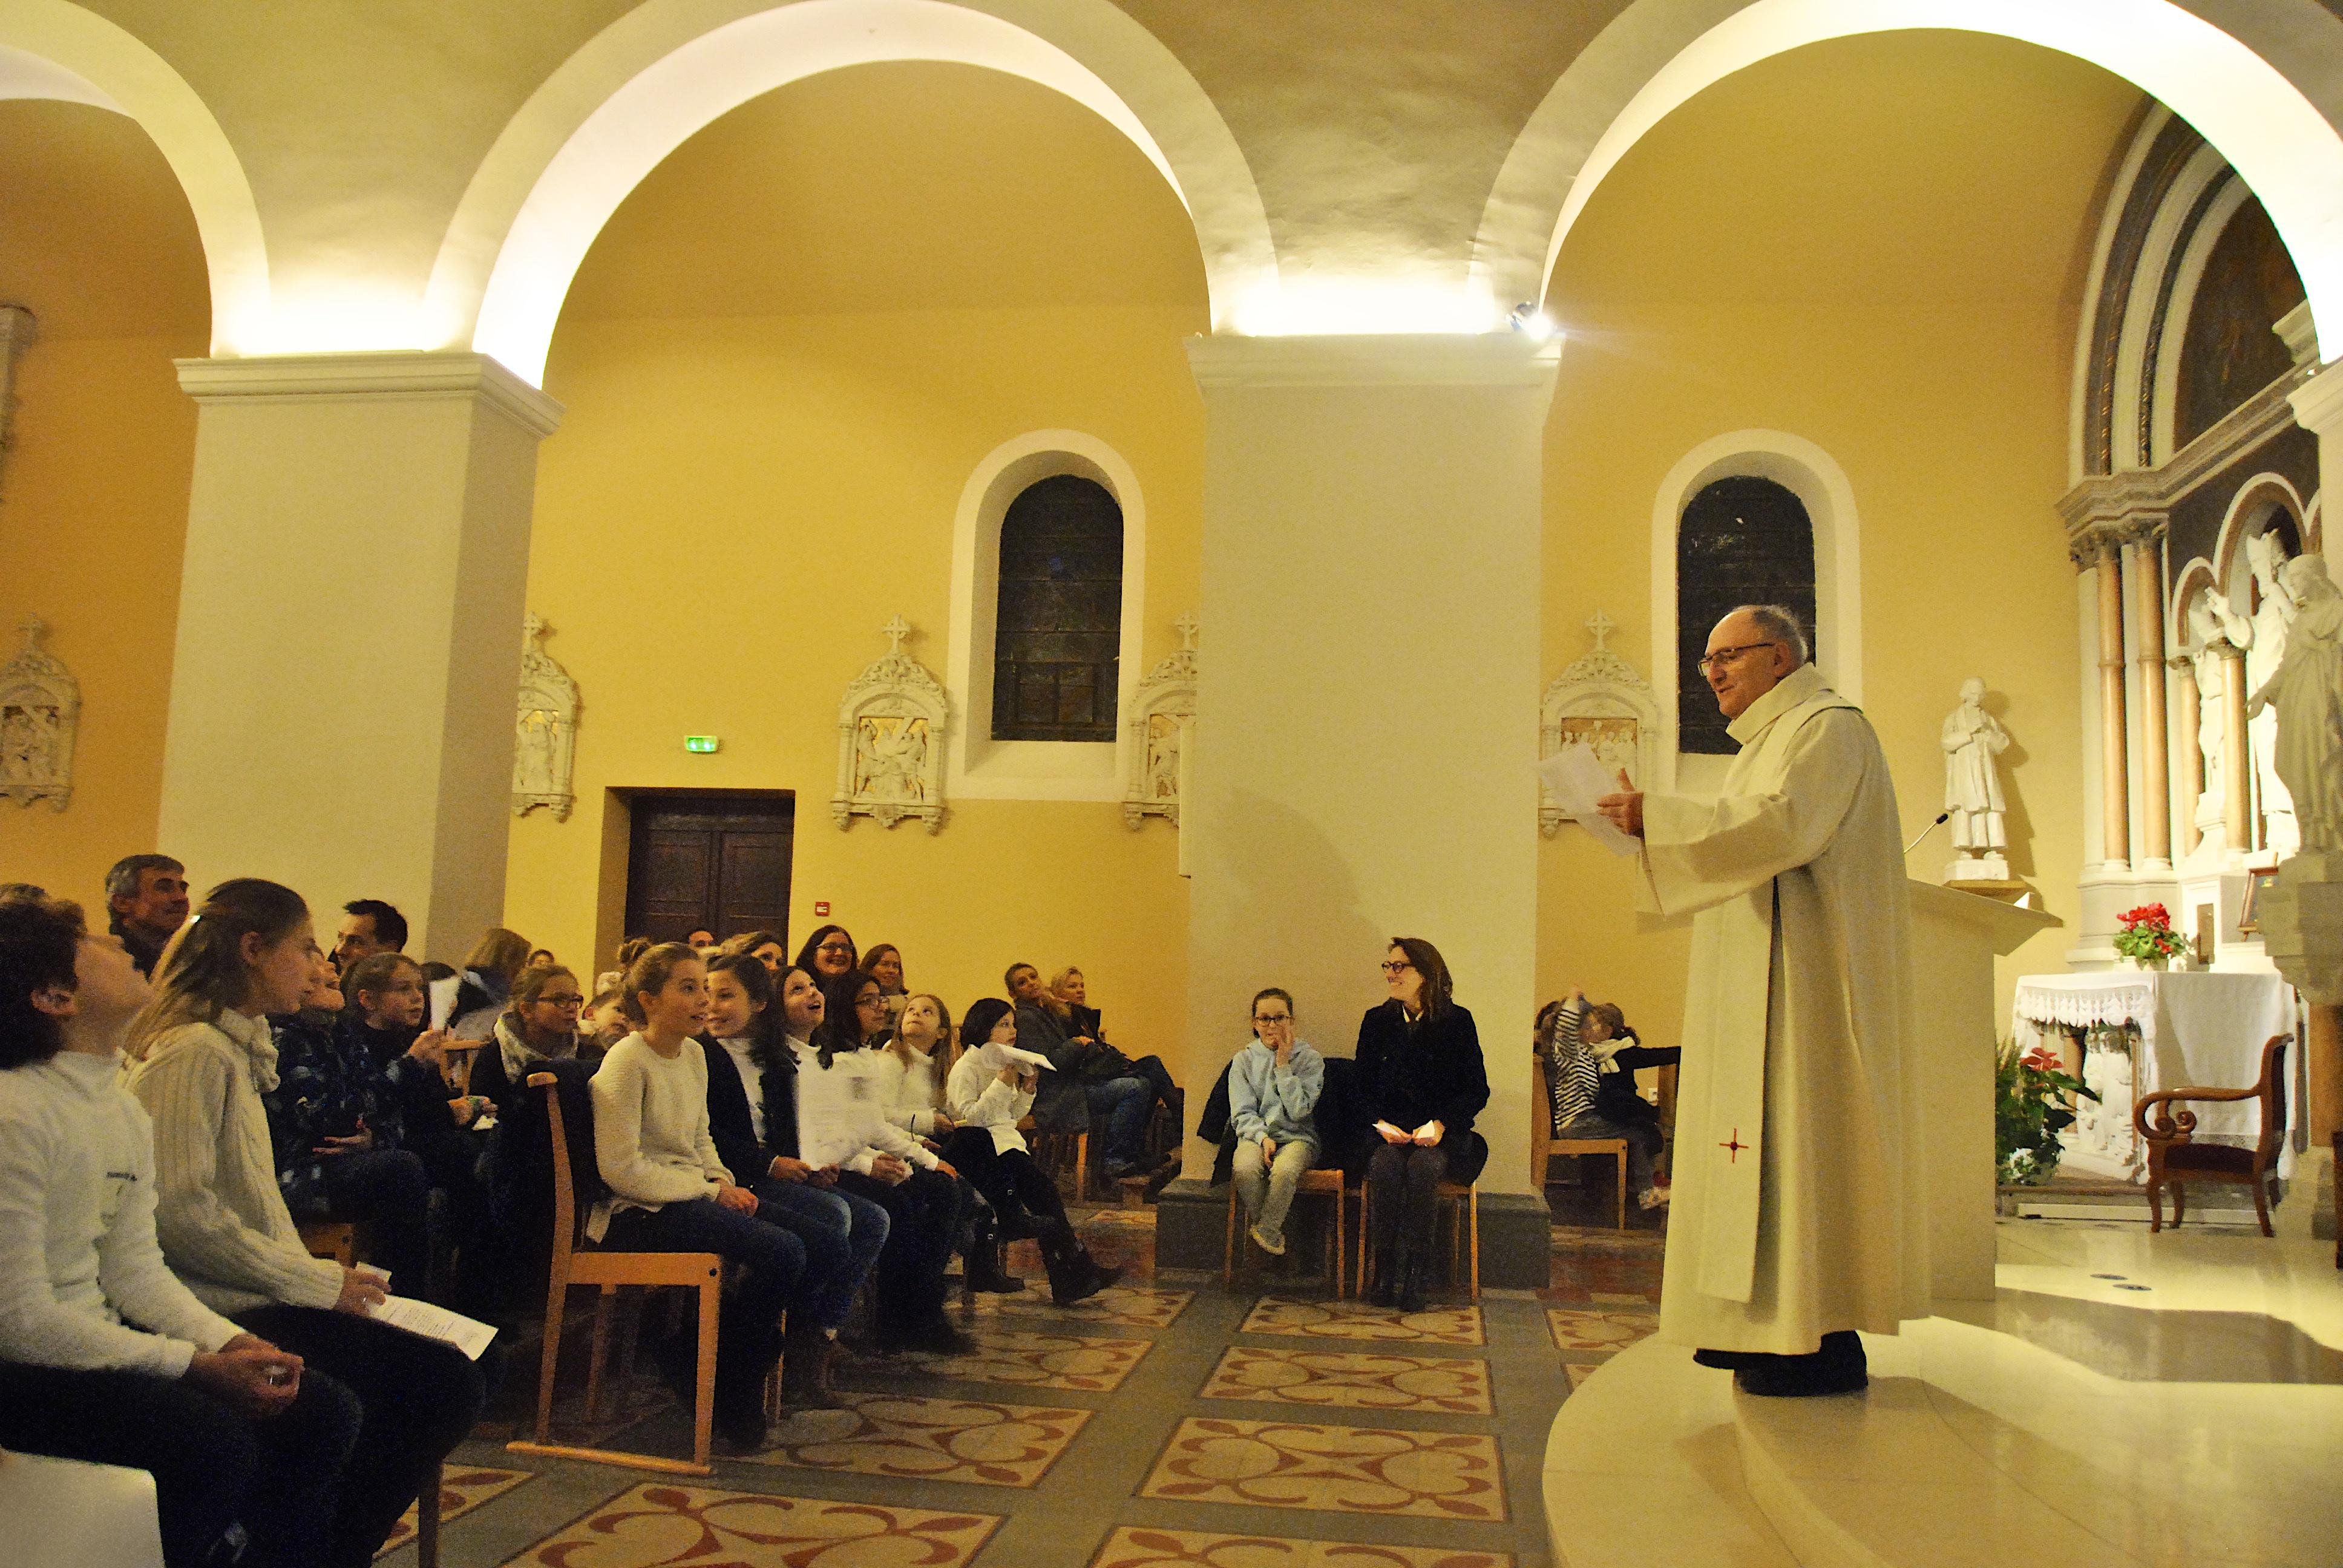 VEILLEE PRIERE MARIE - 08-12-2017 - 34